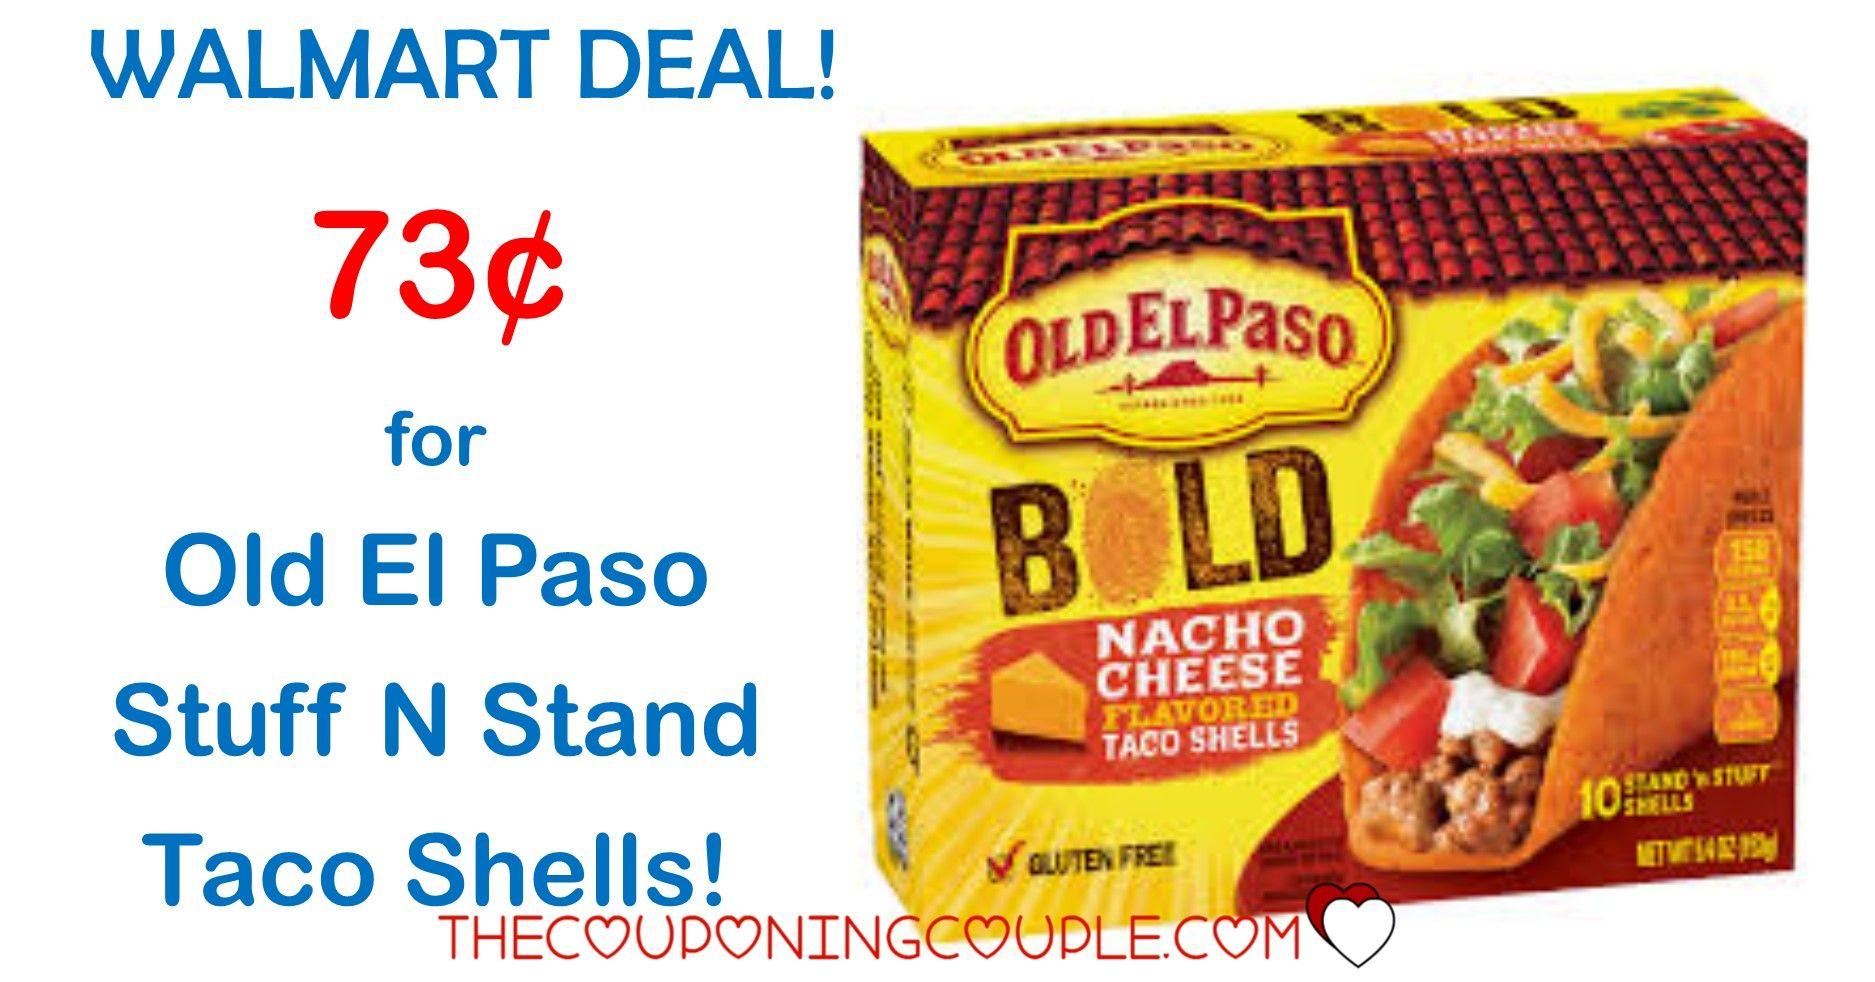 Hot Walmart Deal Old El Paso Stuff N Stand Taco Shells Only 0 73 Taco Stuffed Shells Walmart Deals El Paso Taco